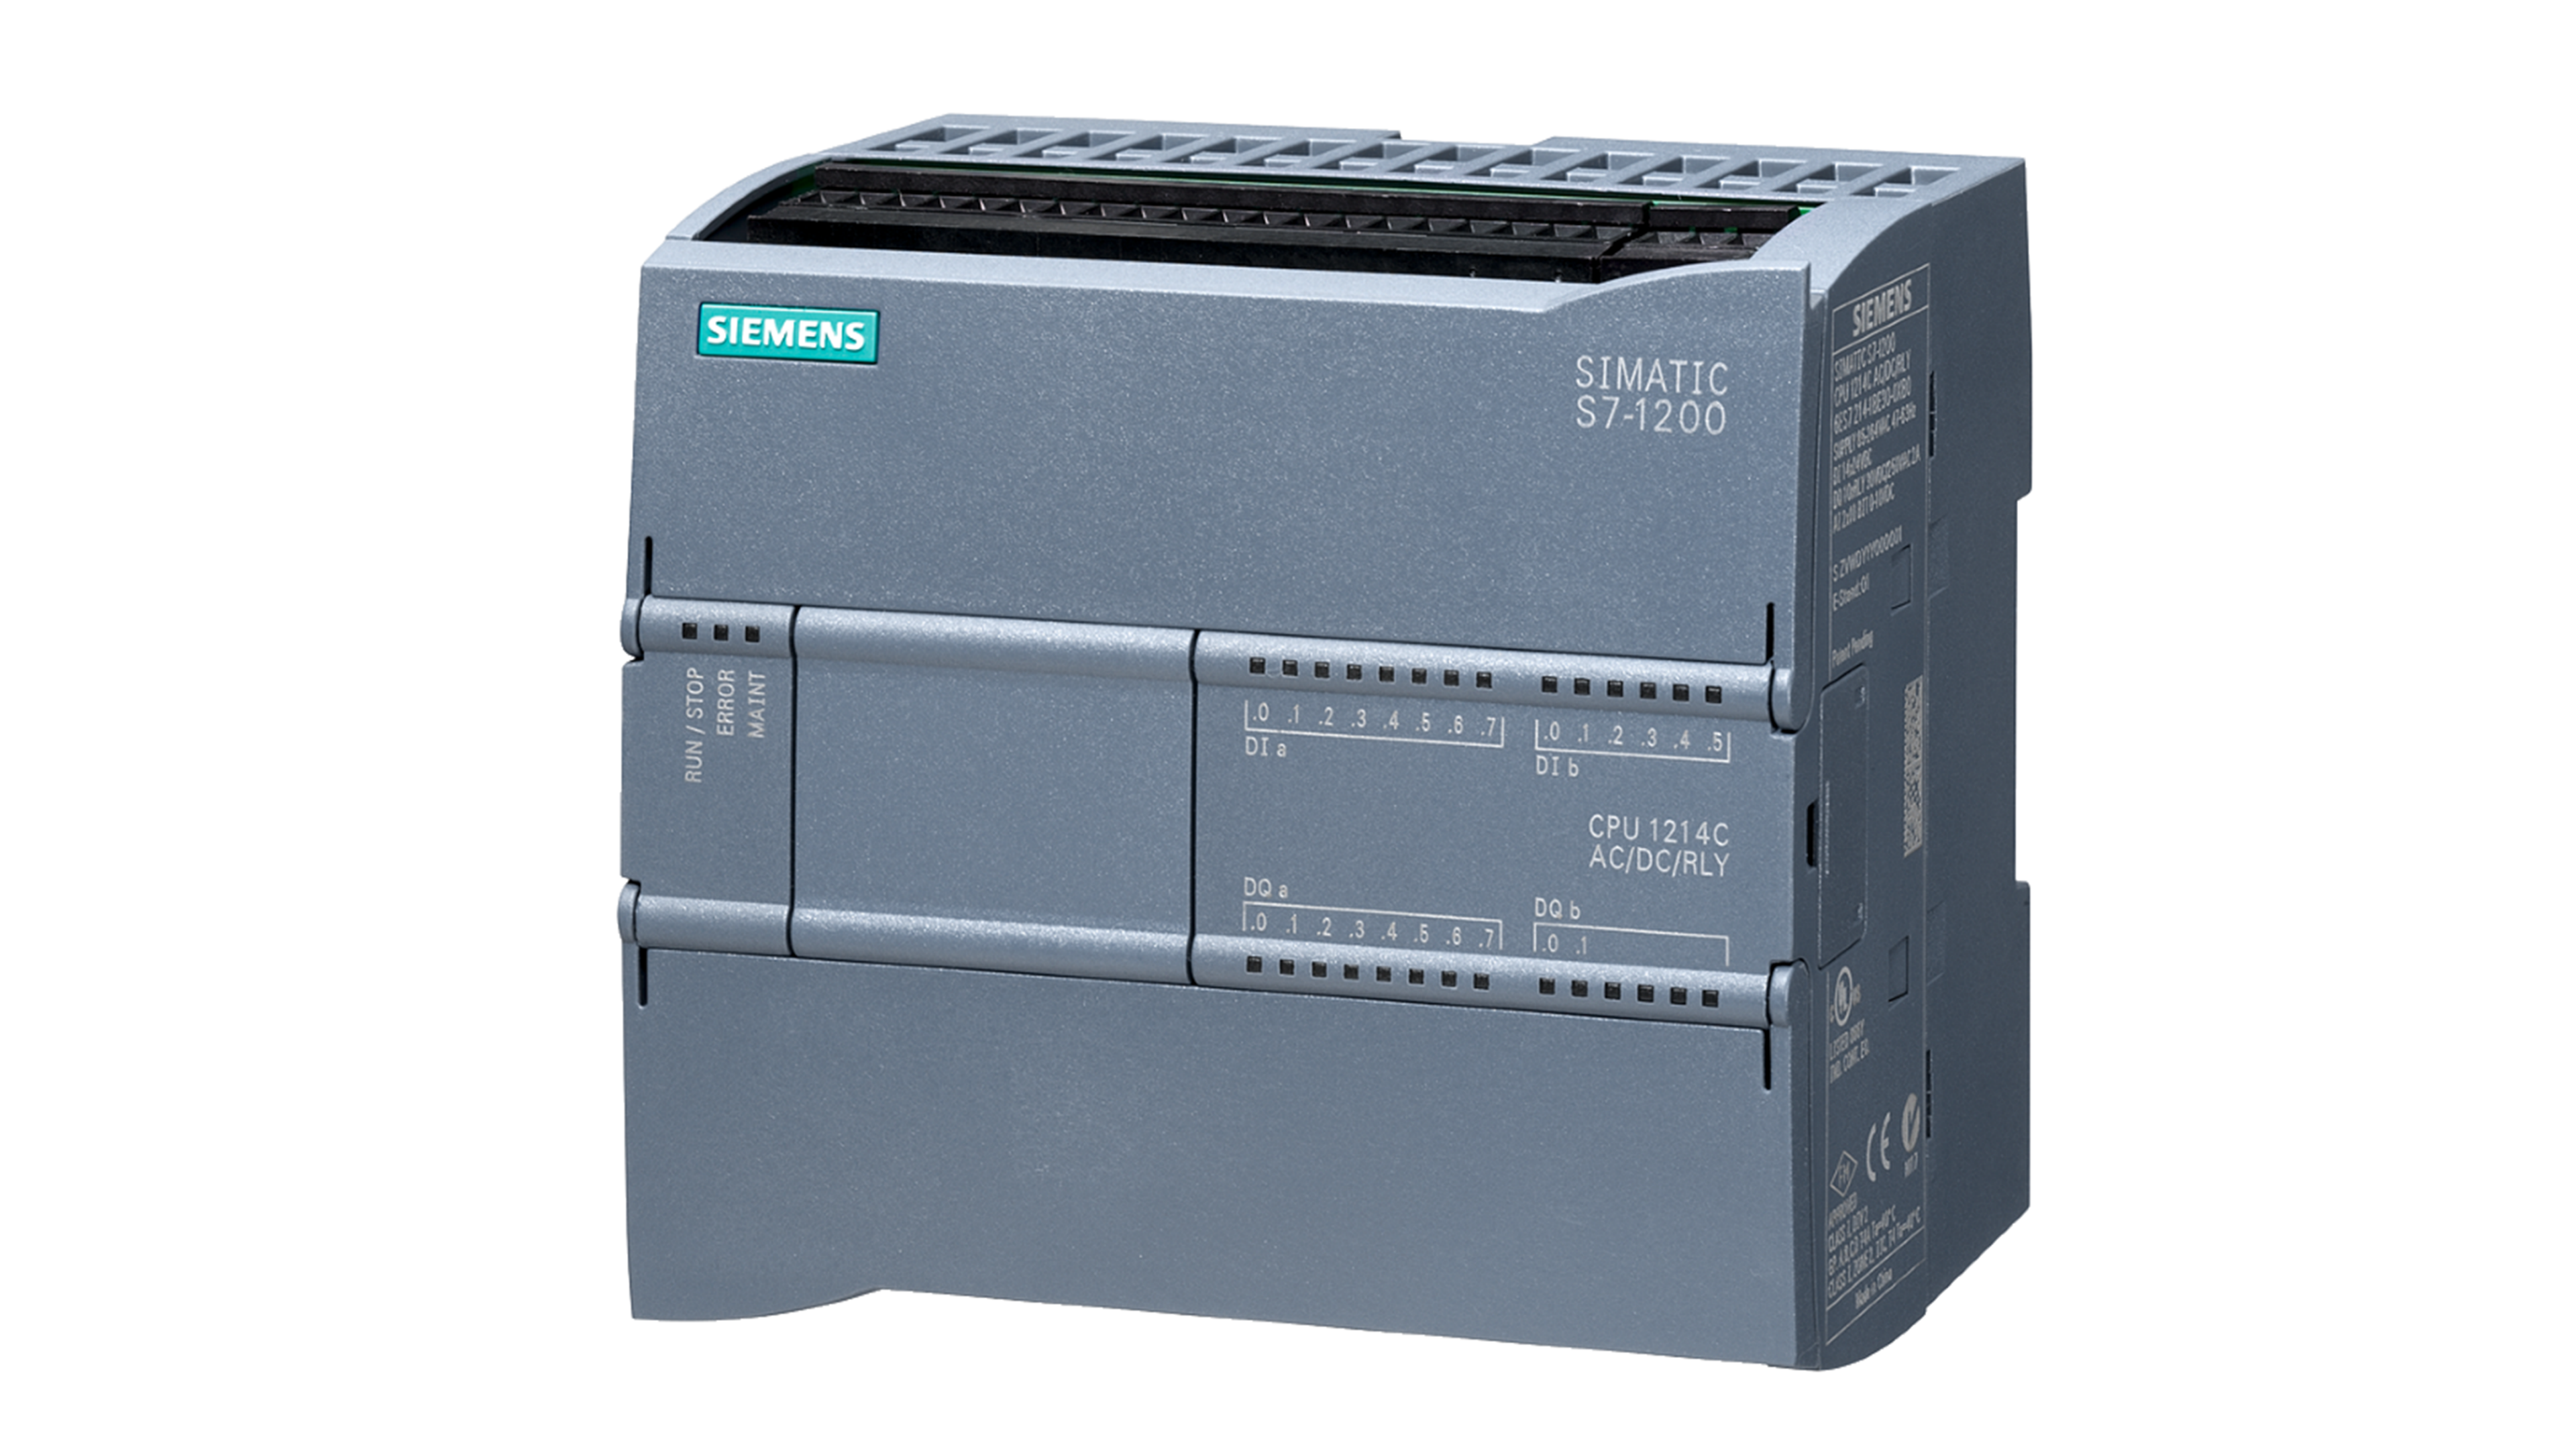 سی پی یو سری سیماتیک برای s7-1200 زیمنس سری S7-1200 - CPU 1214C